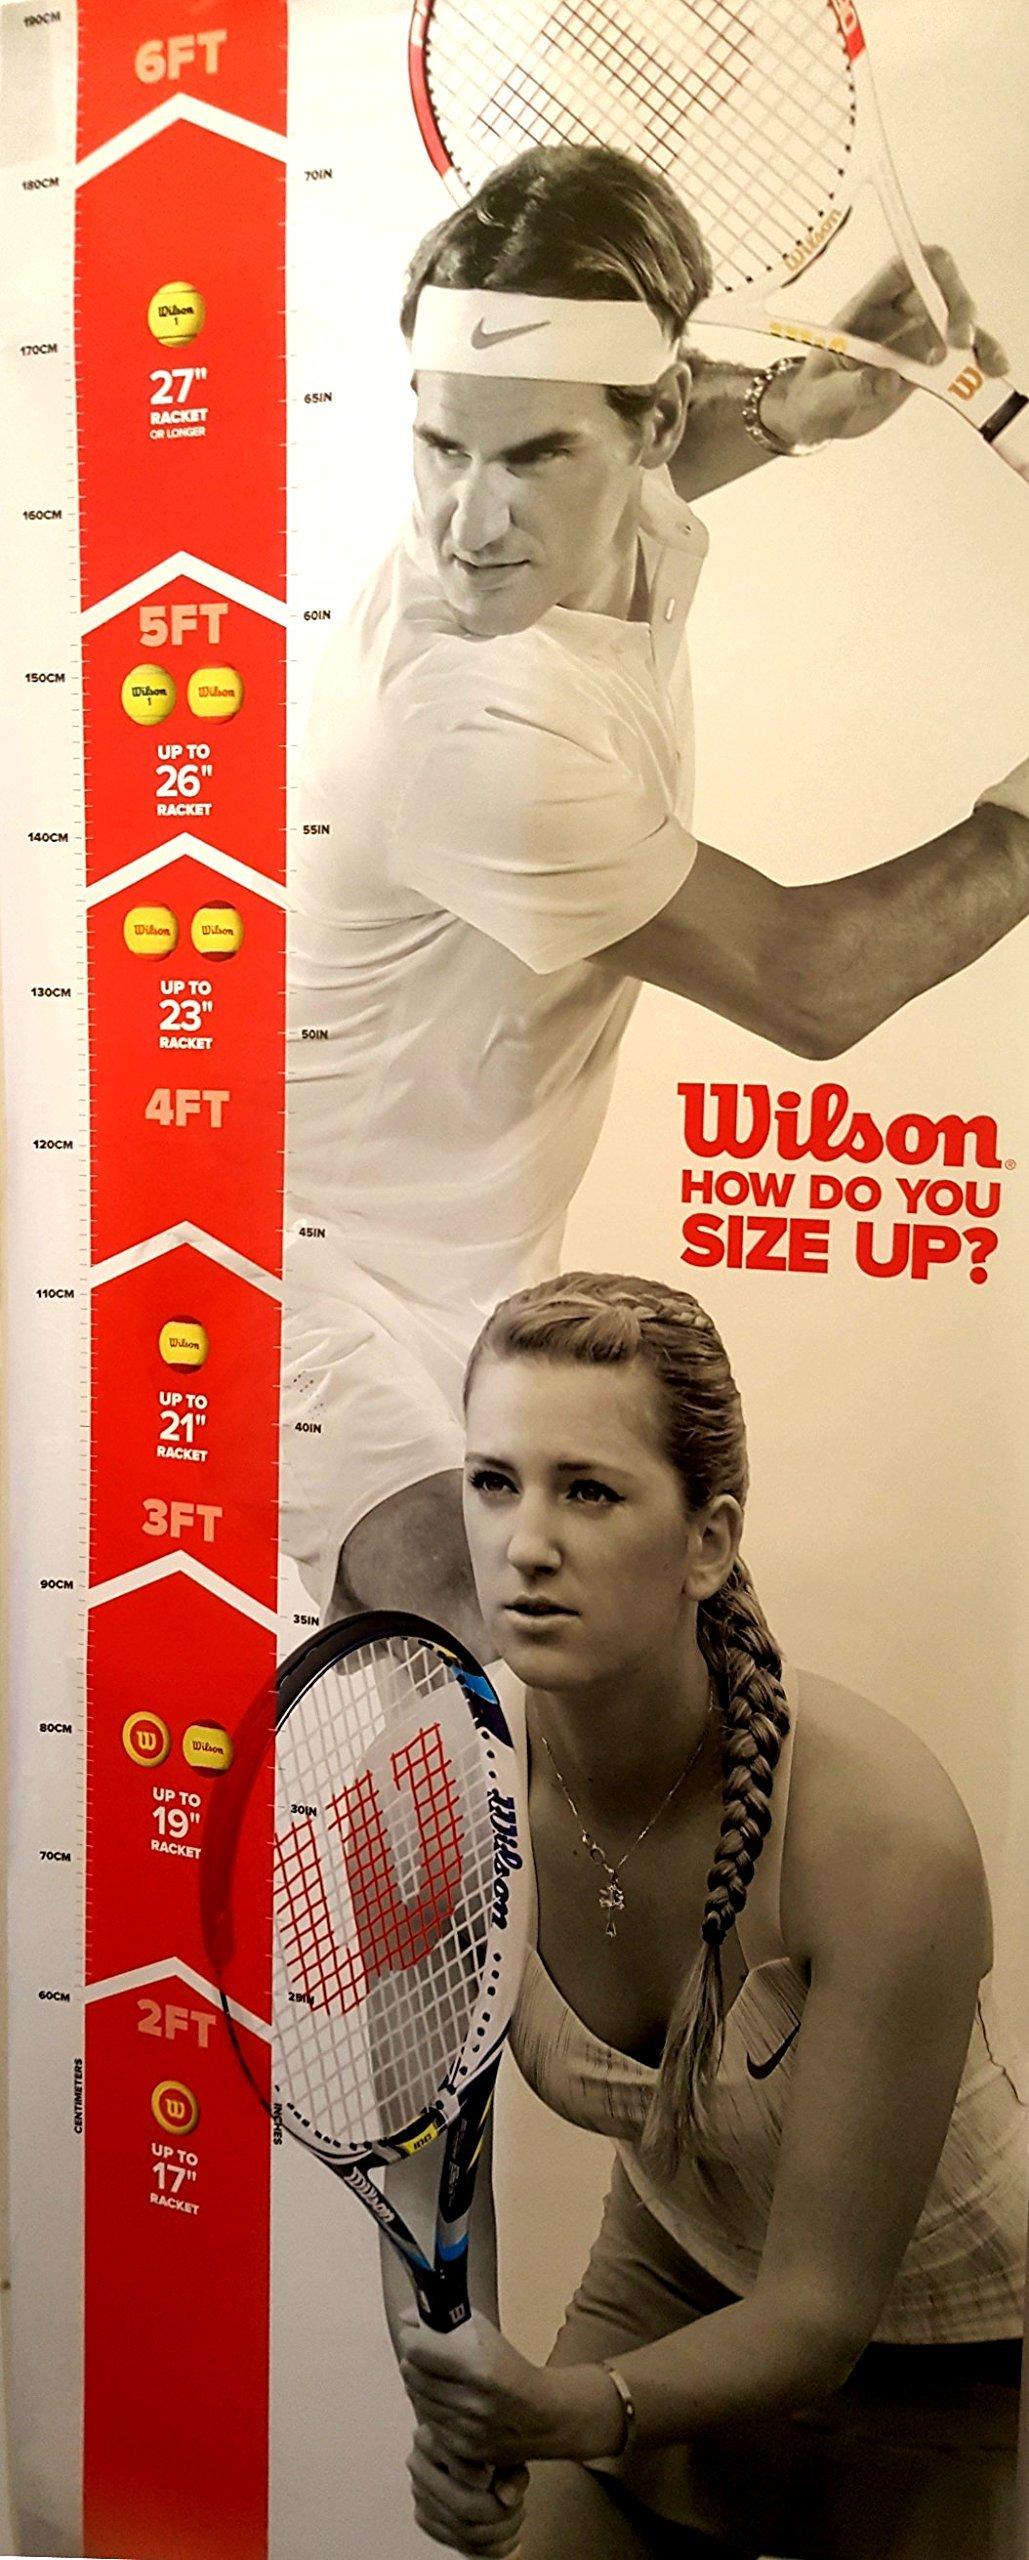 Wilson Junior Burn 23 Tennis Racquet by Wilson (Image #3)